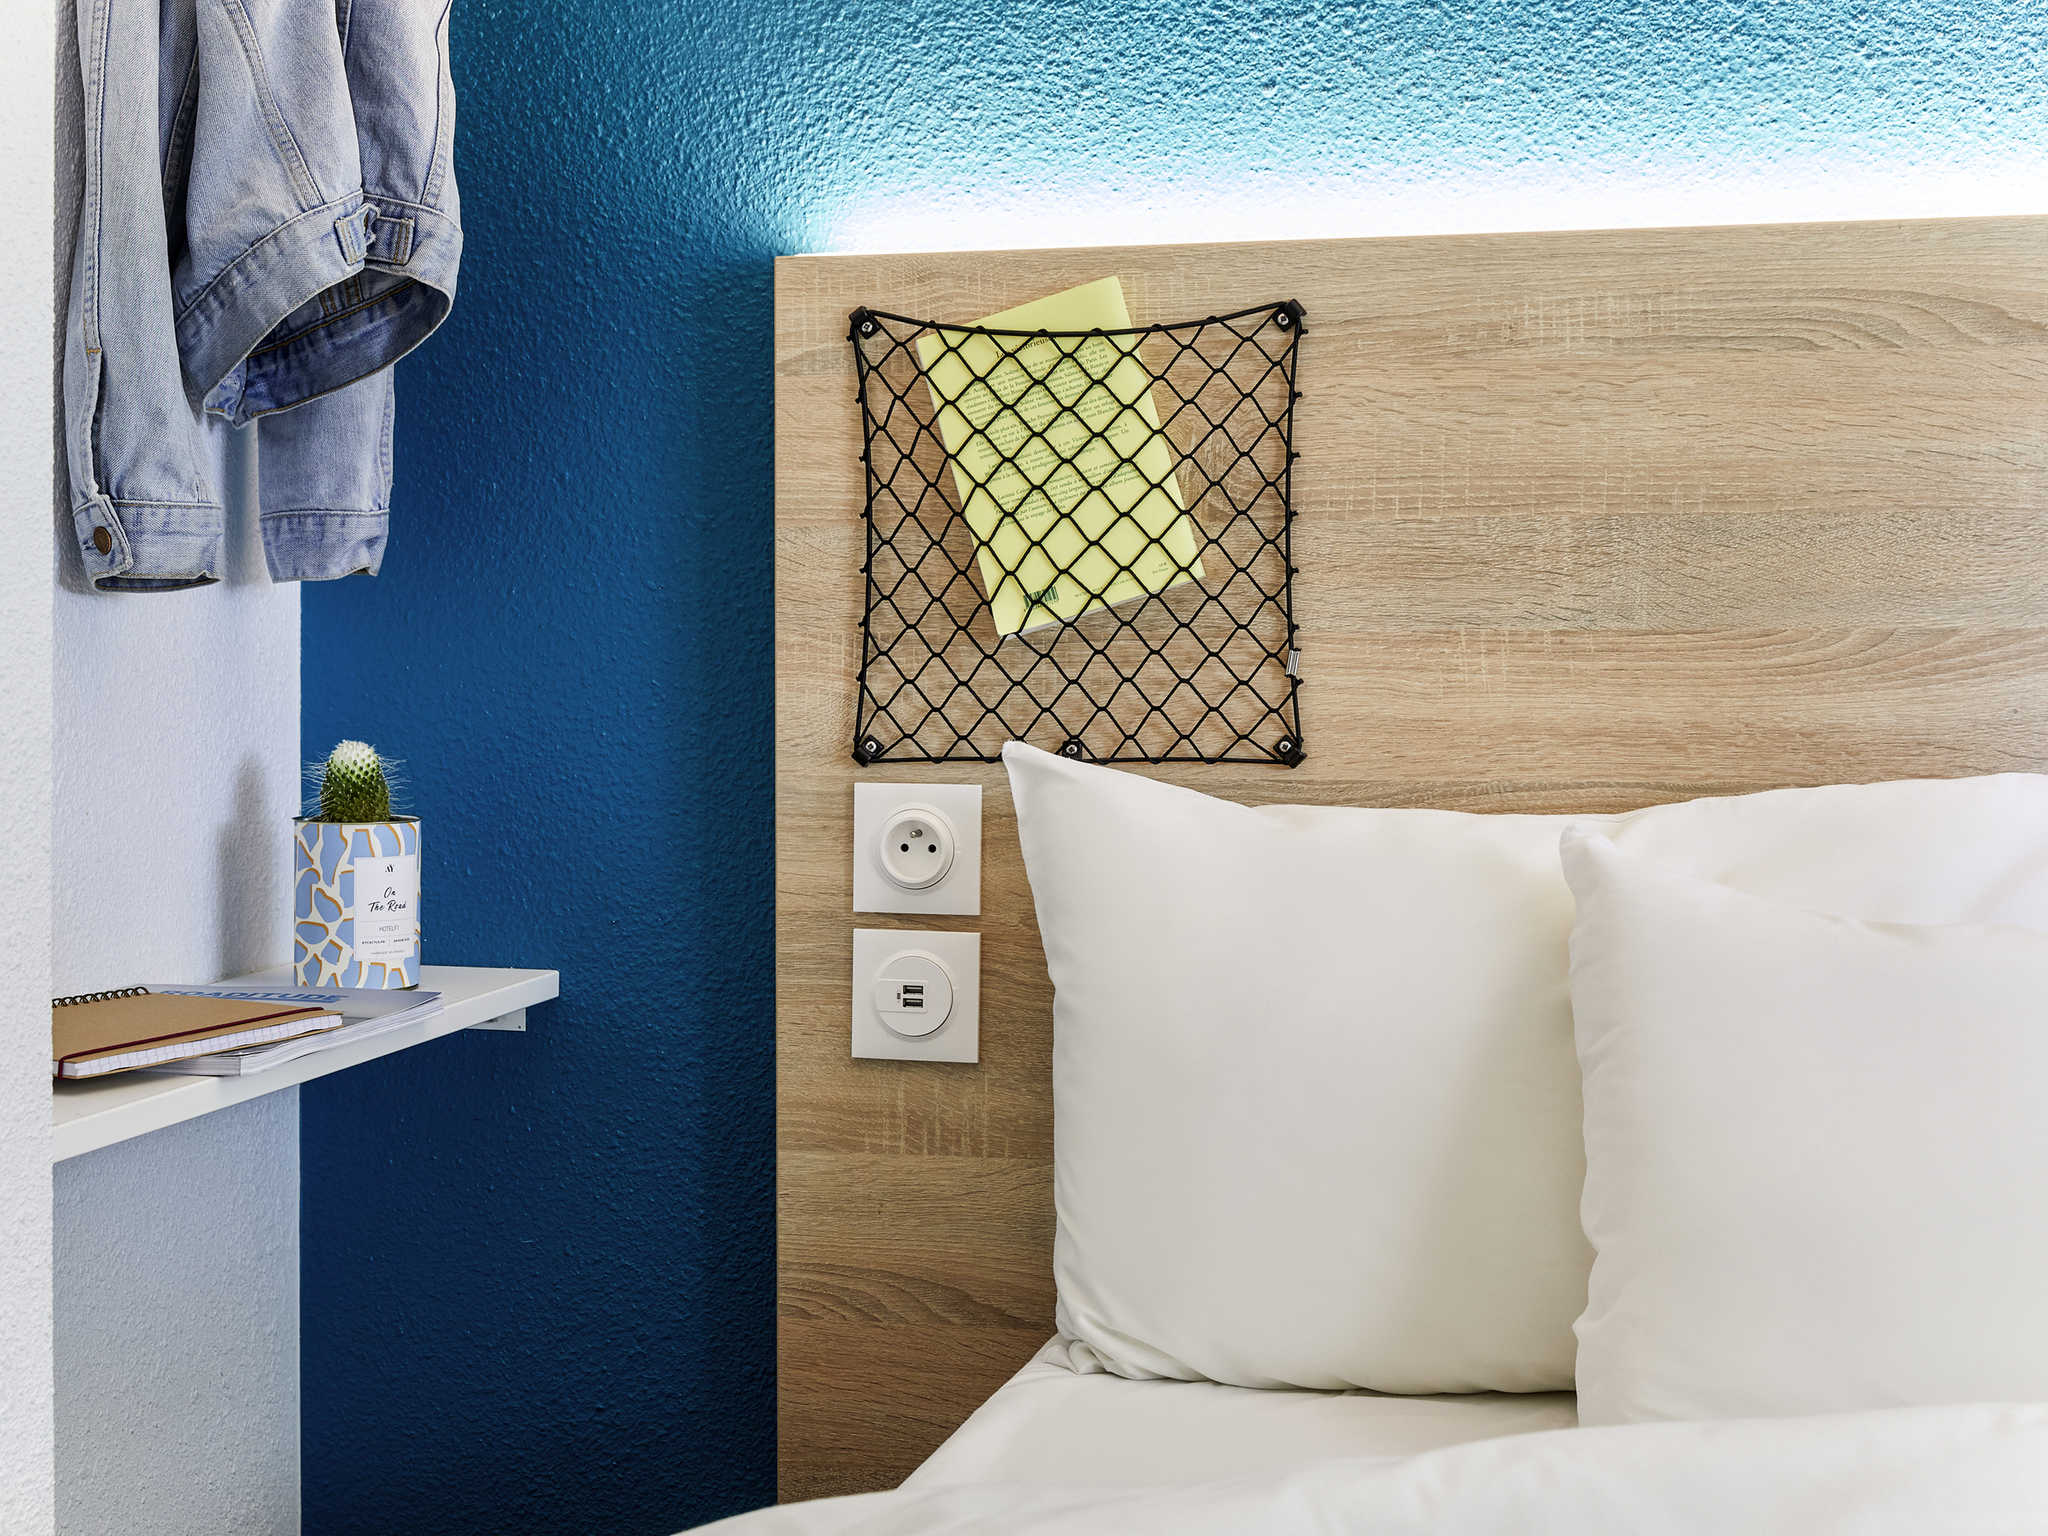 فندق - hotelF1 Roissy Aéroport CDG PN 2